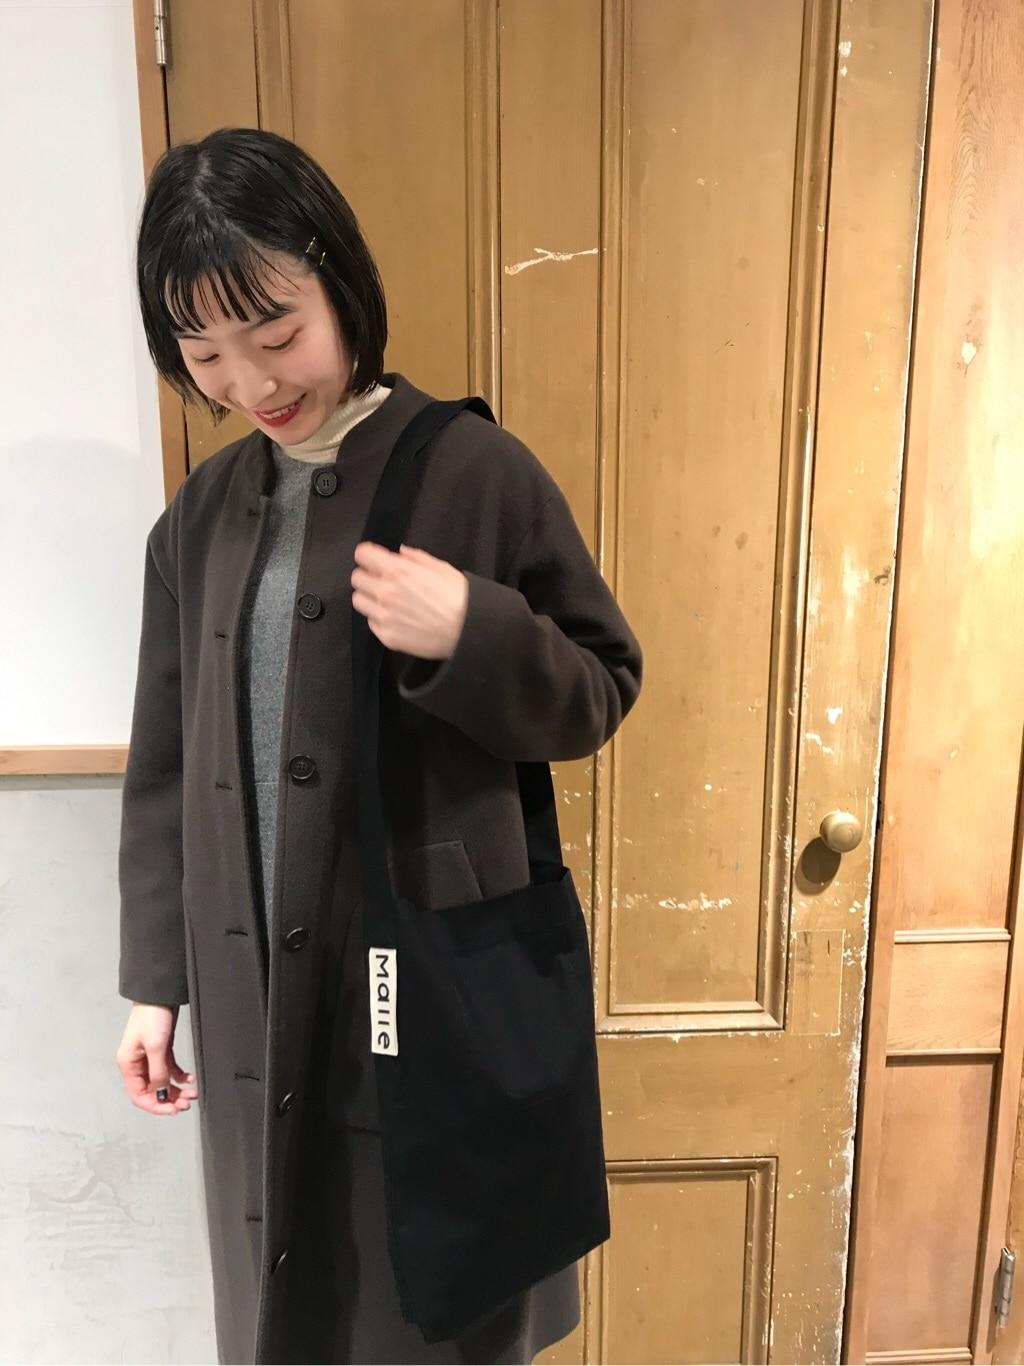 Malle chambre de charme ルミネ新宿 身長:164cm 2020.11.02